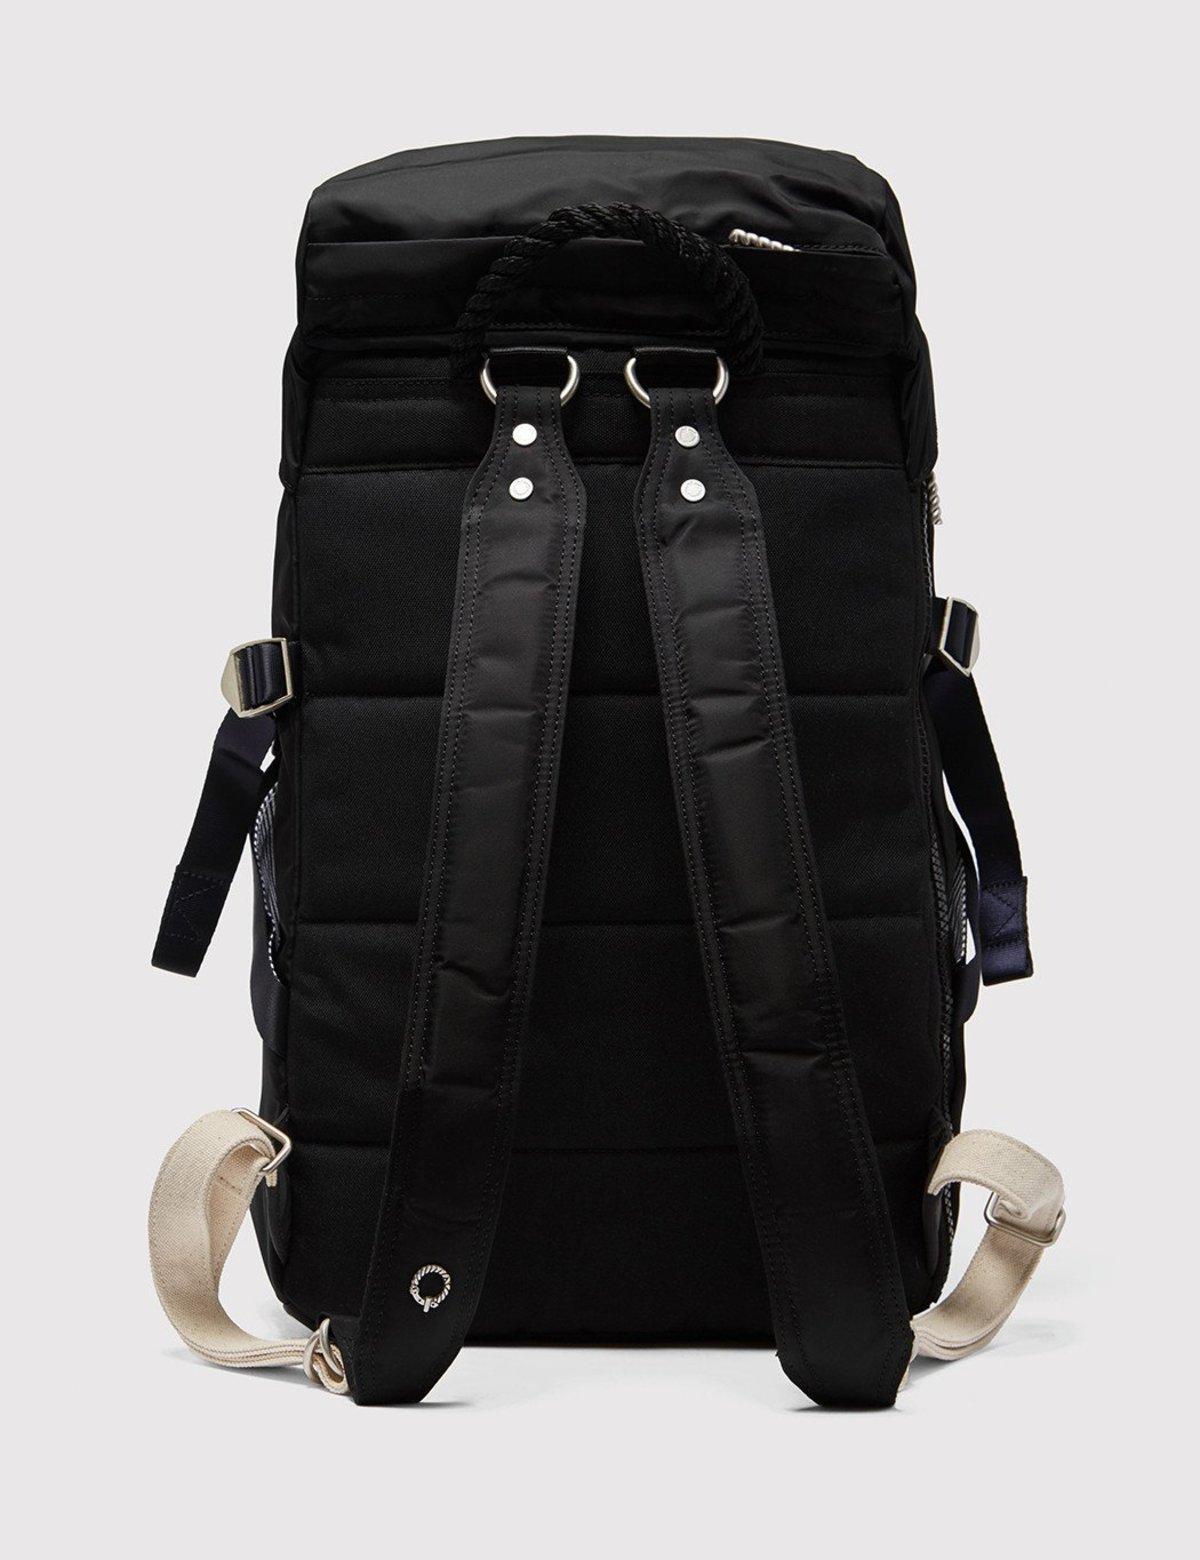 c81e0adb6a11 Stighlorgan Plato Laptop Backpack - Black